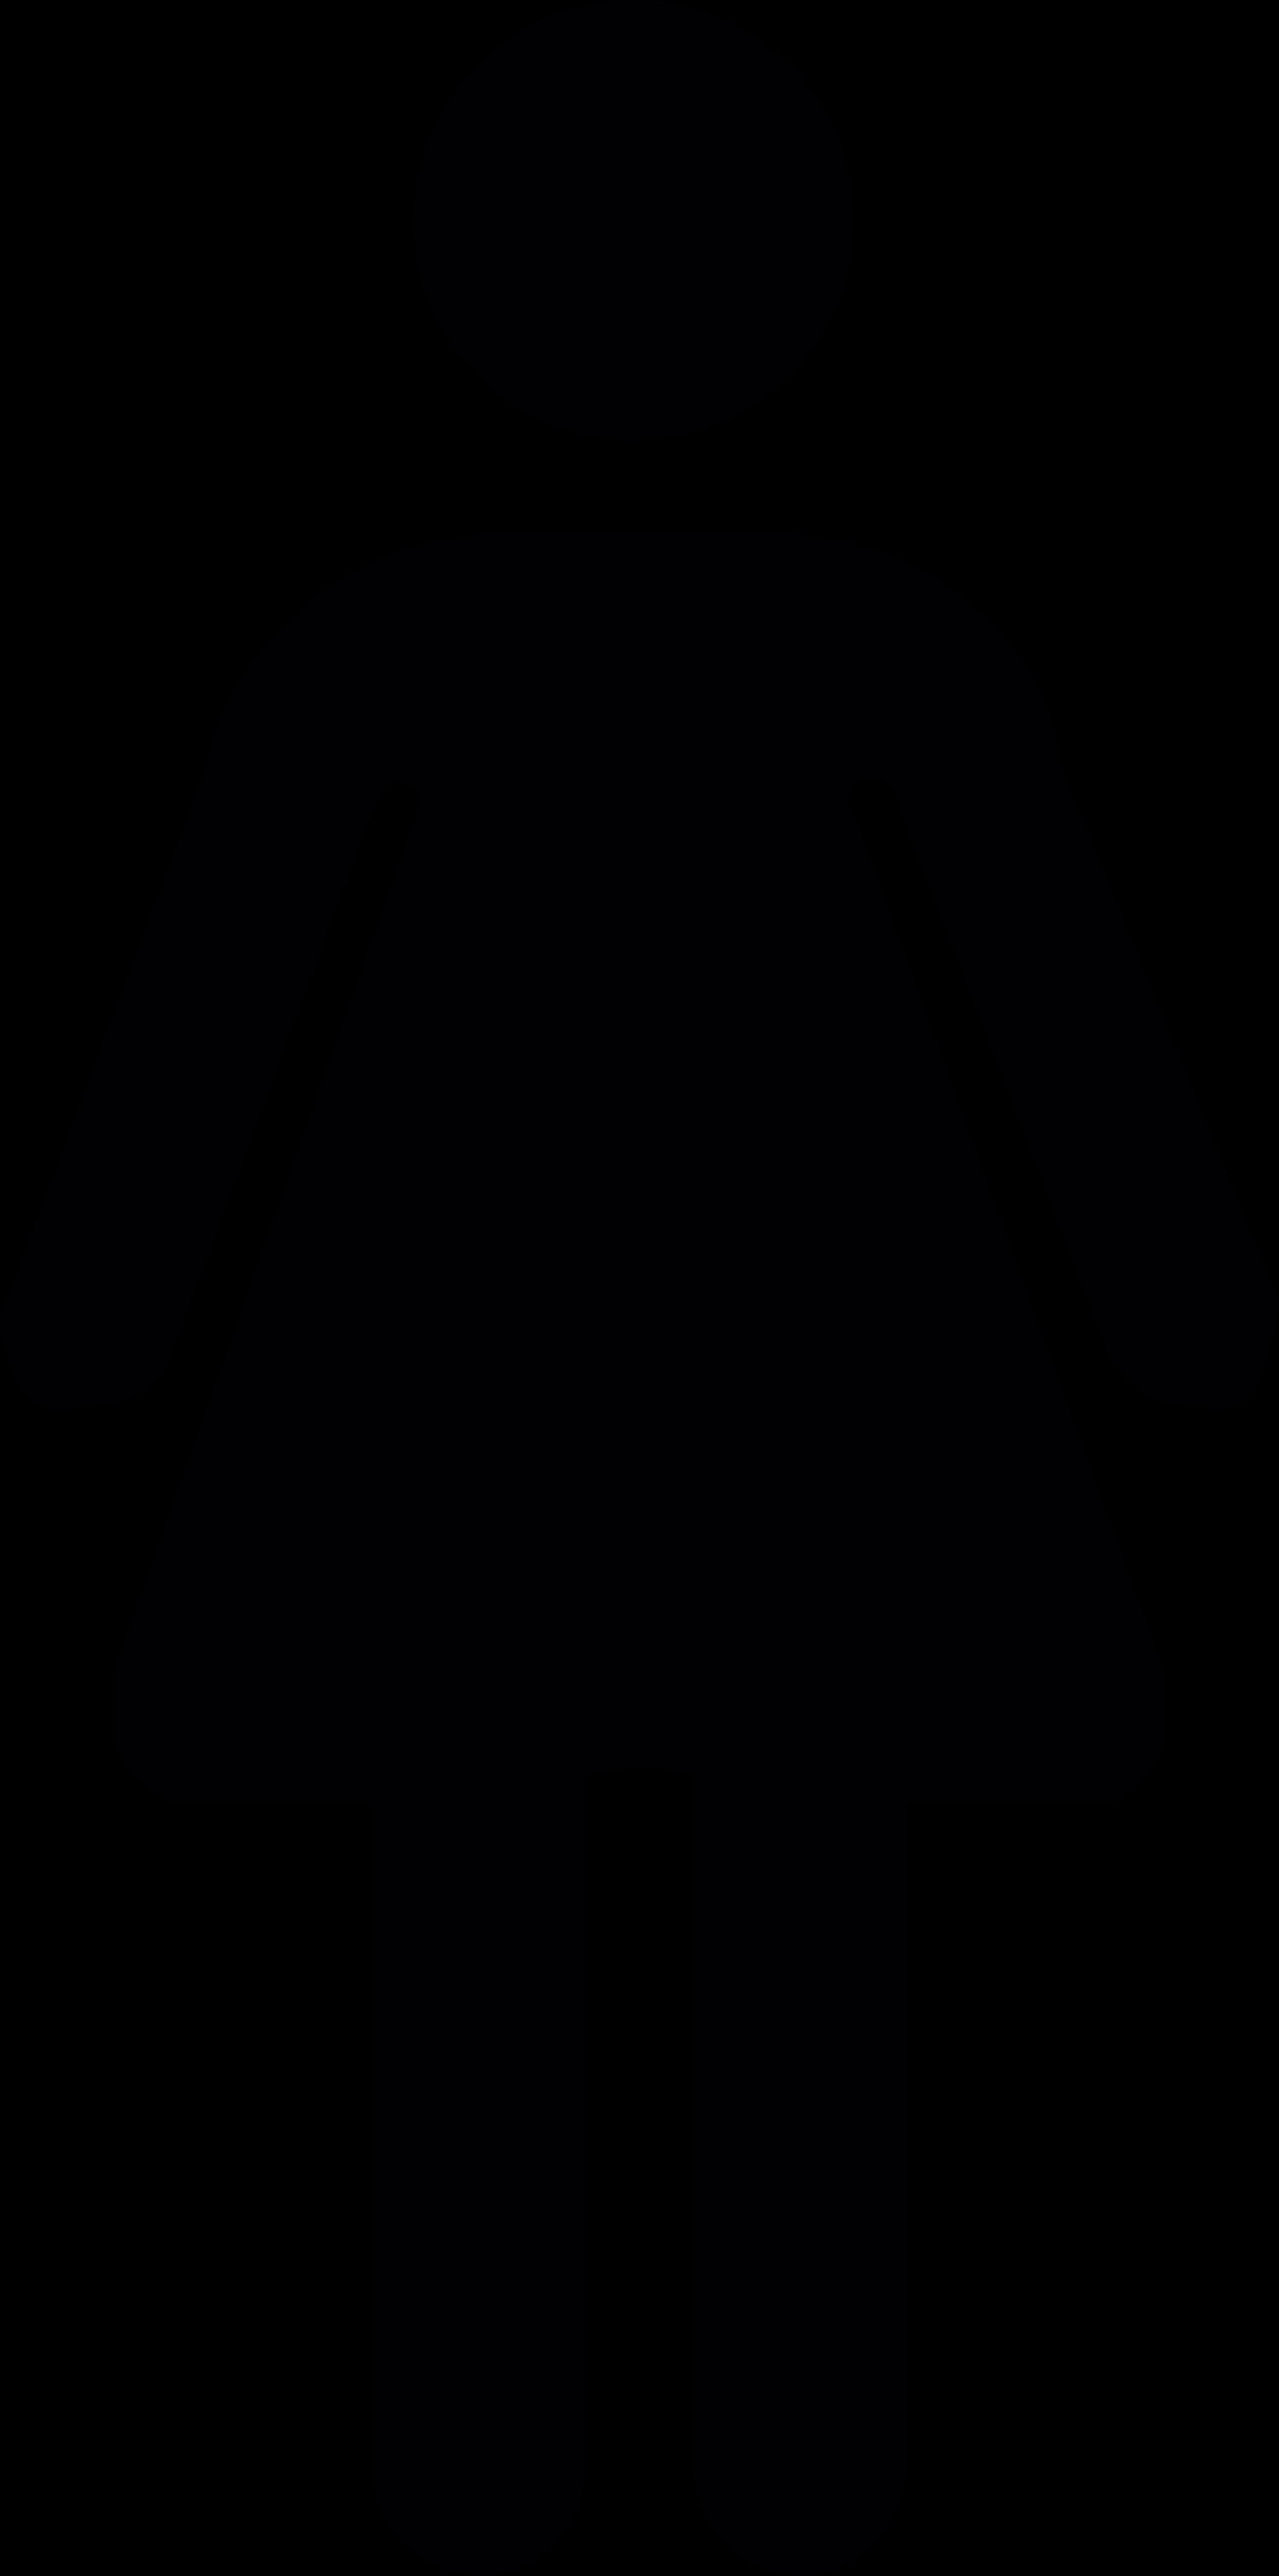 simbolo-banheiro-feminino-mulheres